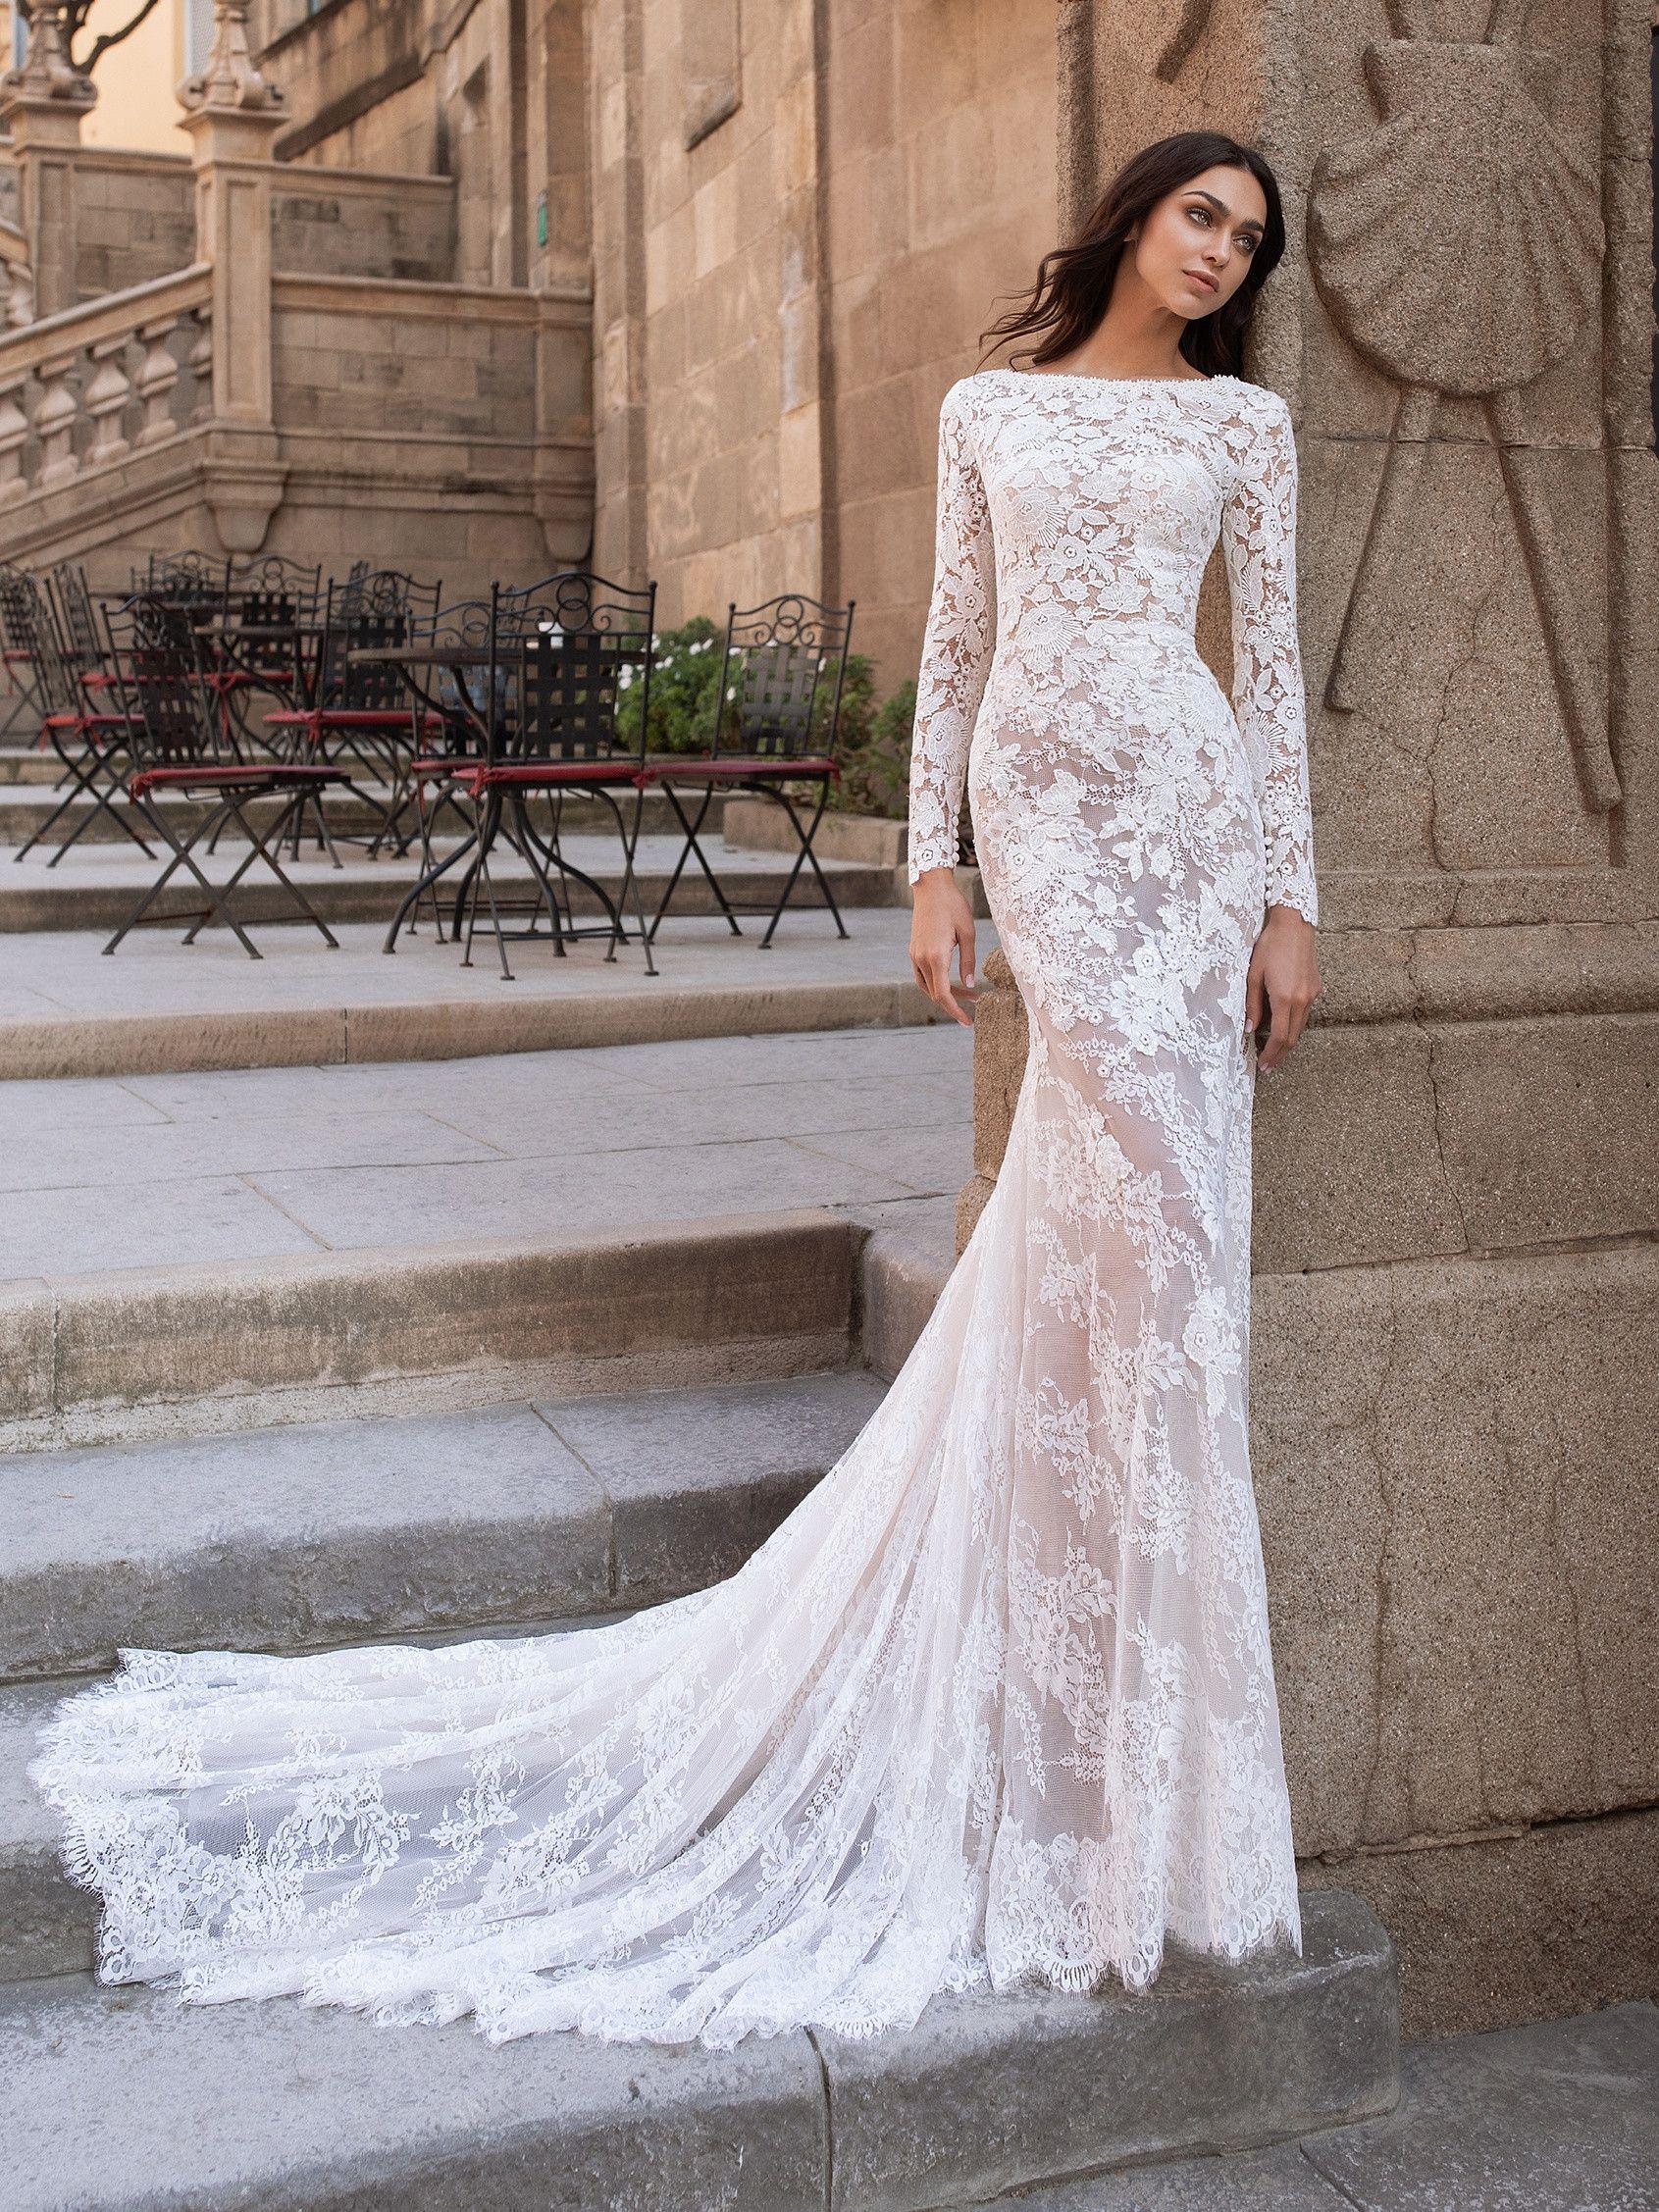 Telesto Sheath Wedding Dress Lace Expensive Wedding Dress Wedding Dresses